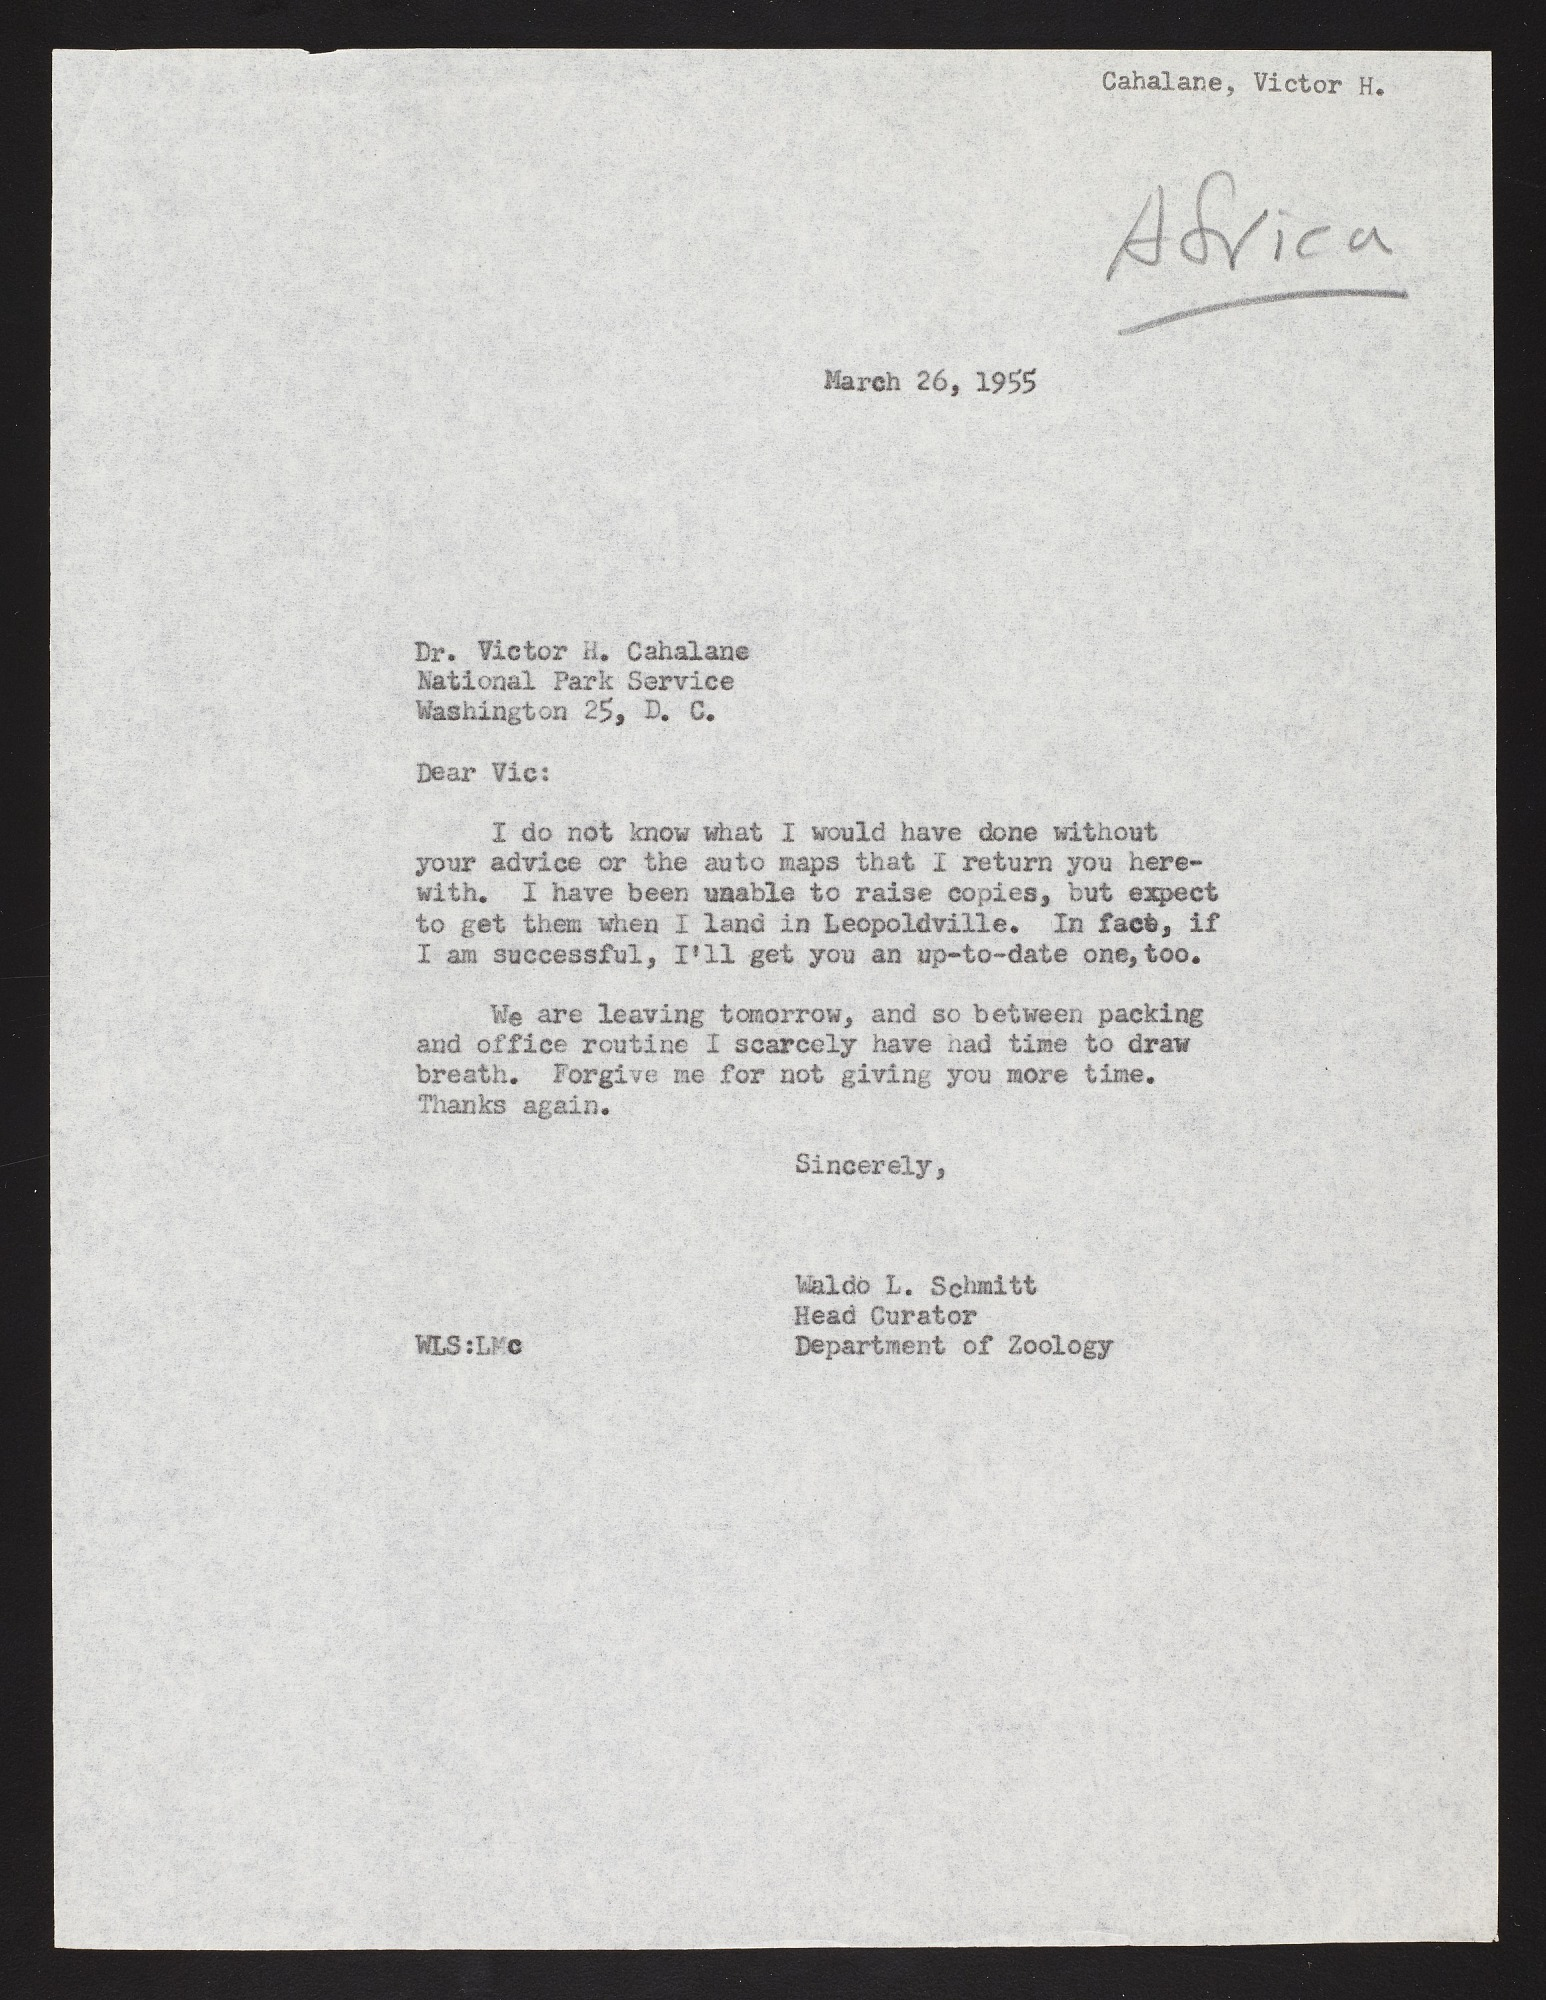 Smithsonian-Bredin Belgian Congo Expedition, 1955 : correspondence C